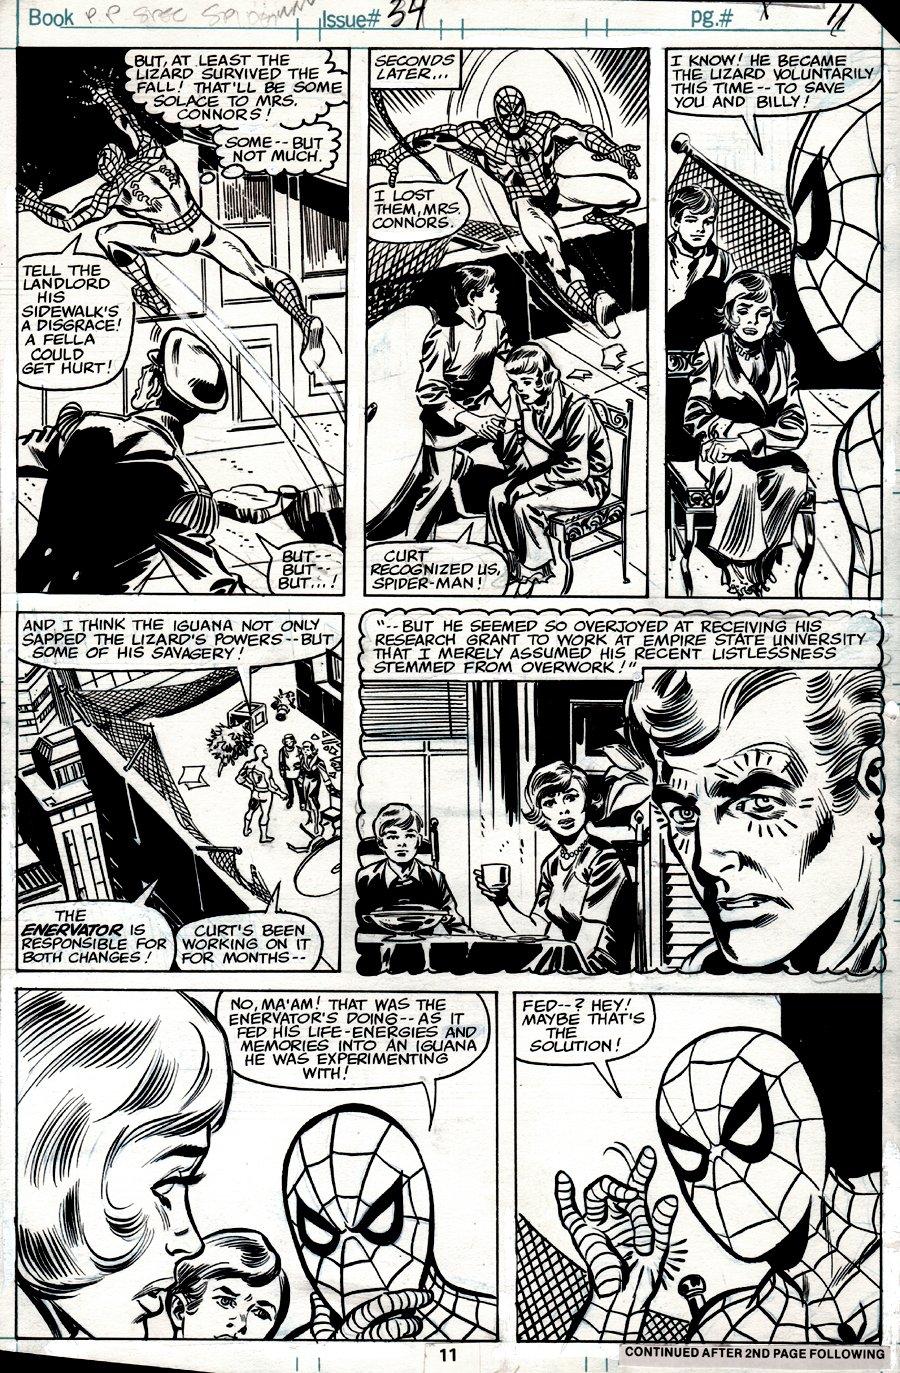 Spectacular Spider-Man #34 p 11 (SPIDER-MAN IN 6 OF 7 PANELS!) 1979